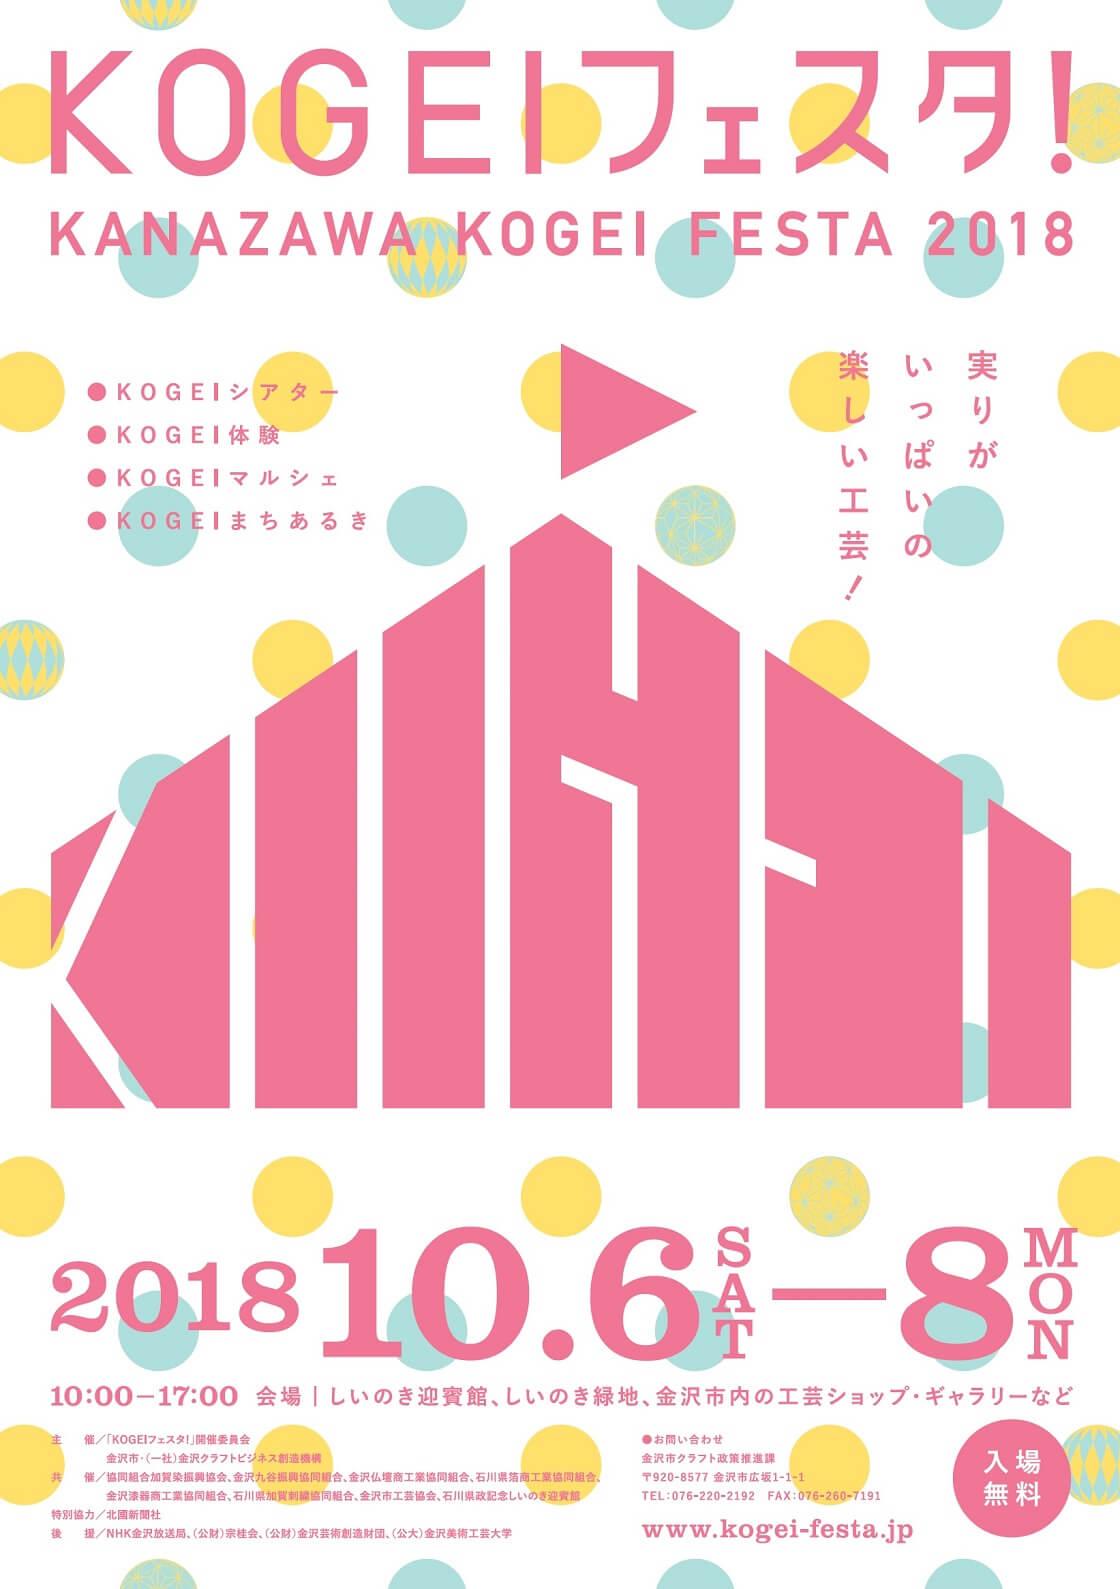 KOGEIフェスタのパンフレット